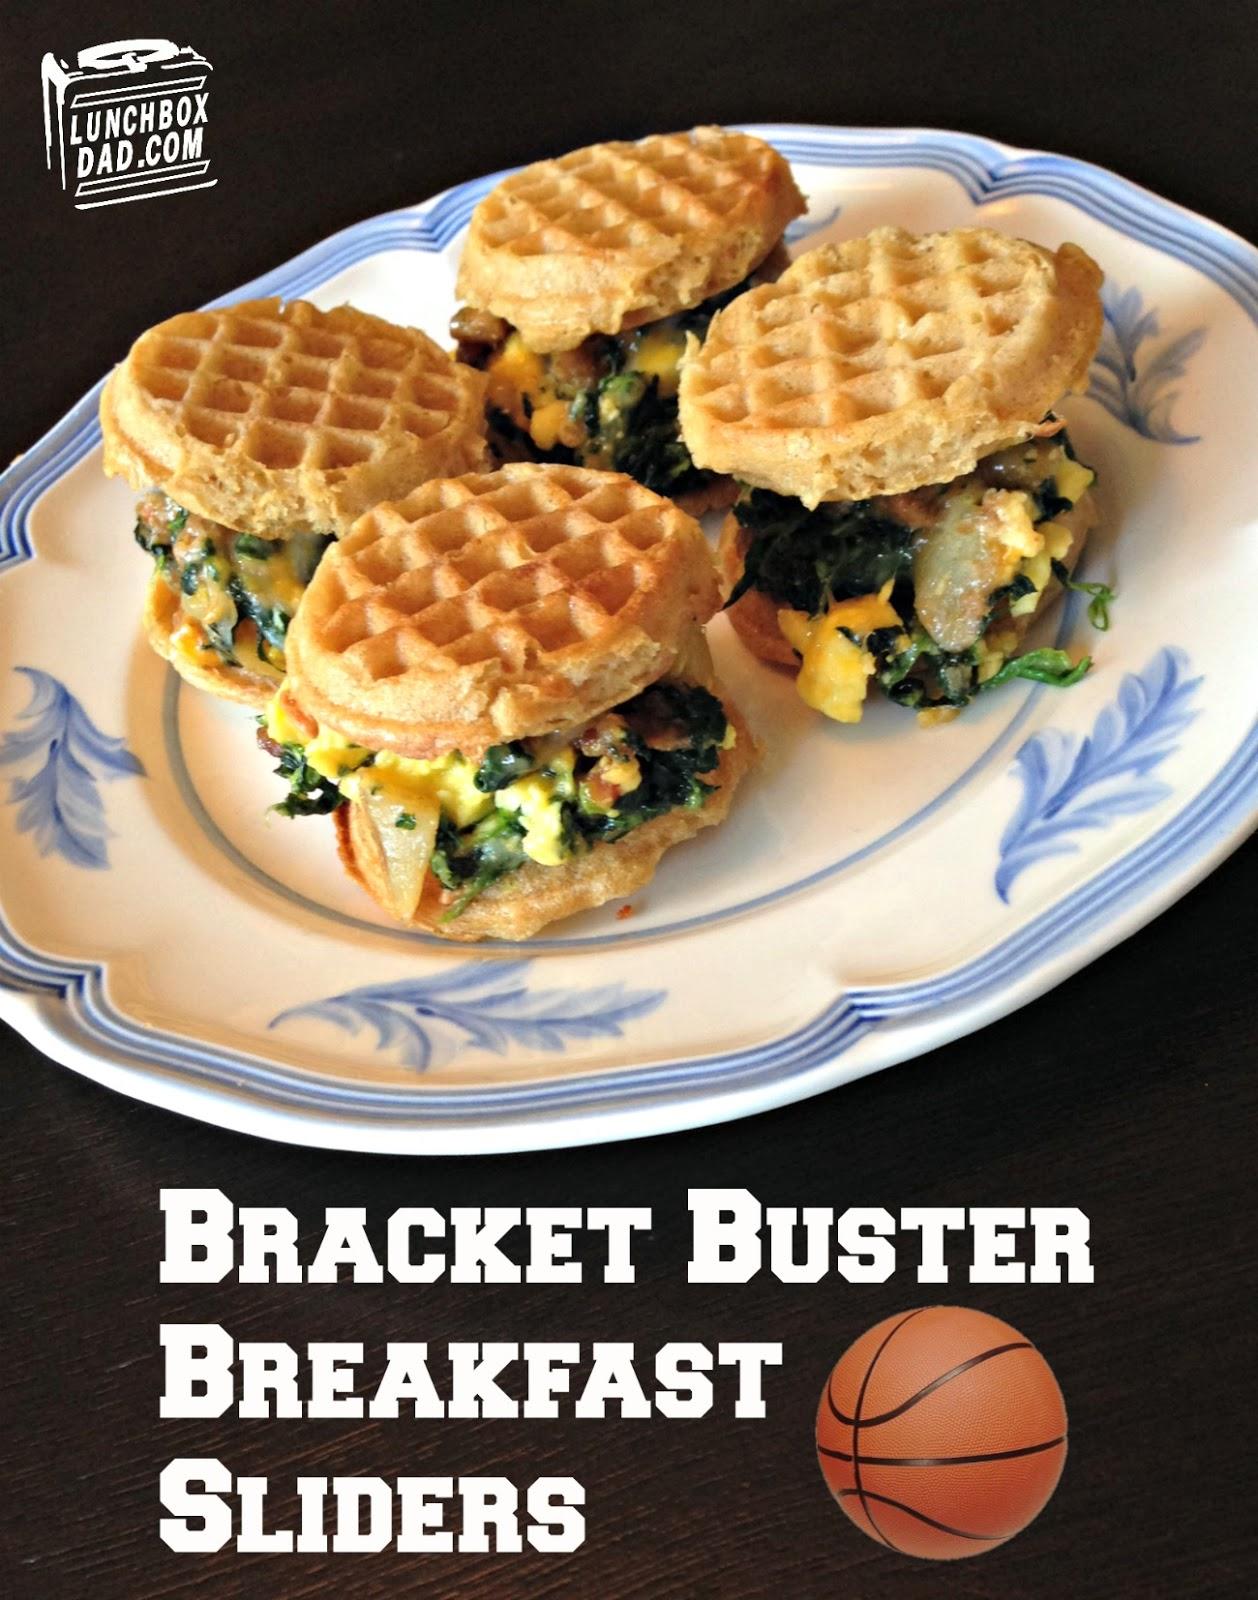 Bracket Buster Breakfast Sliders #FrozenChefMadness